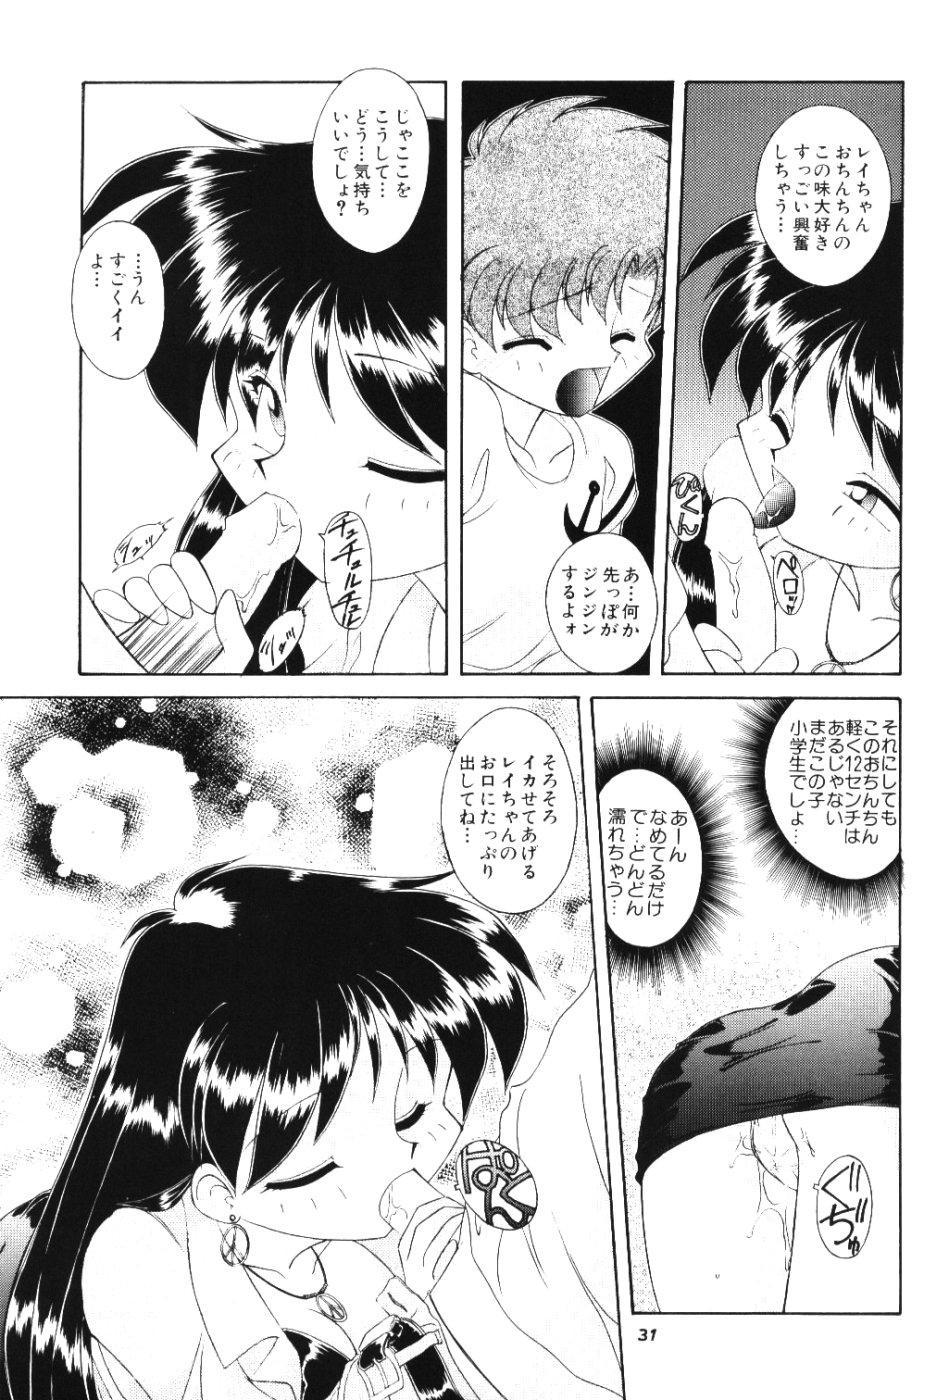 Moon Memories Vol. 2 29